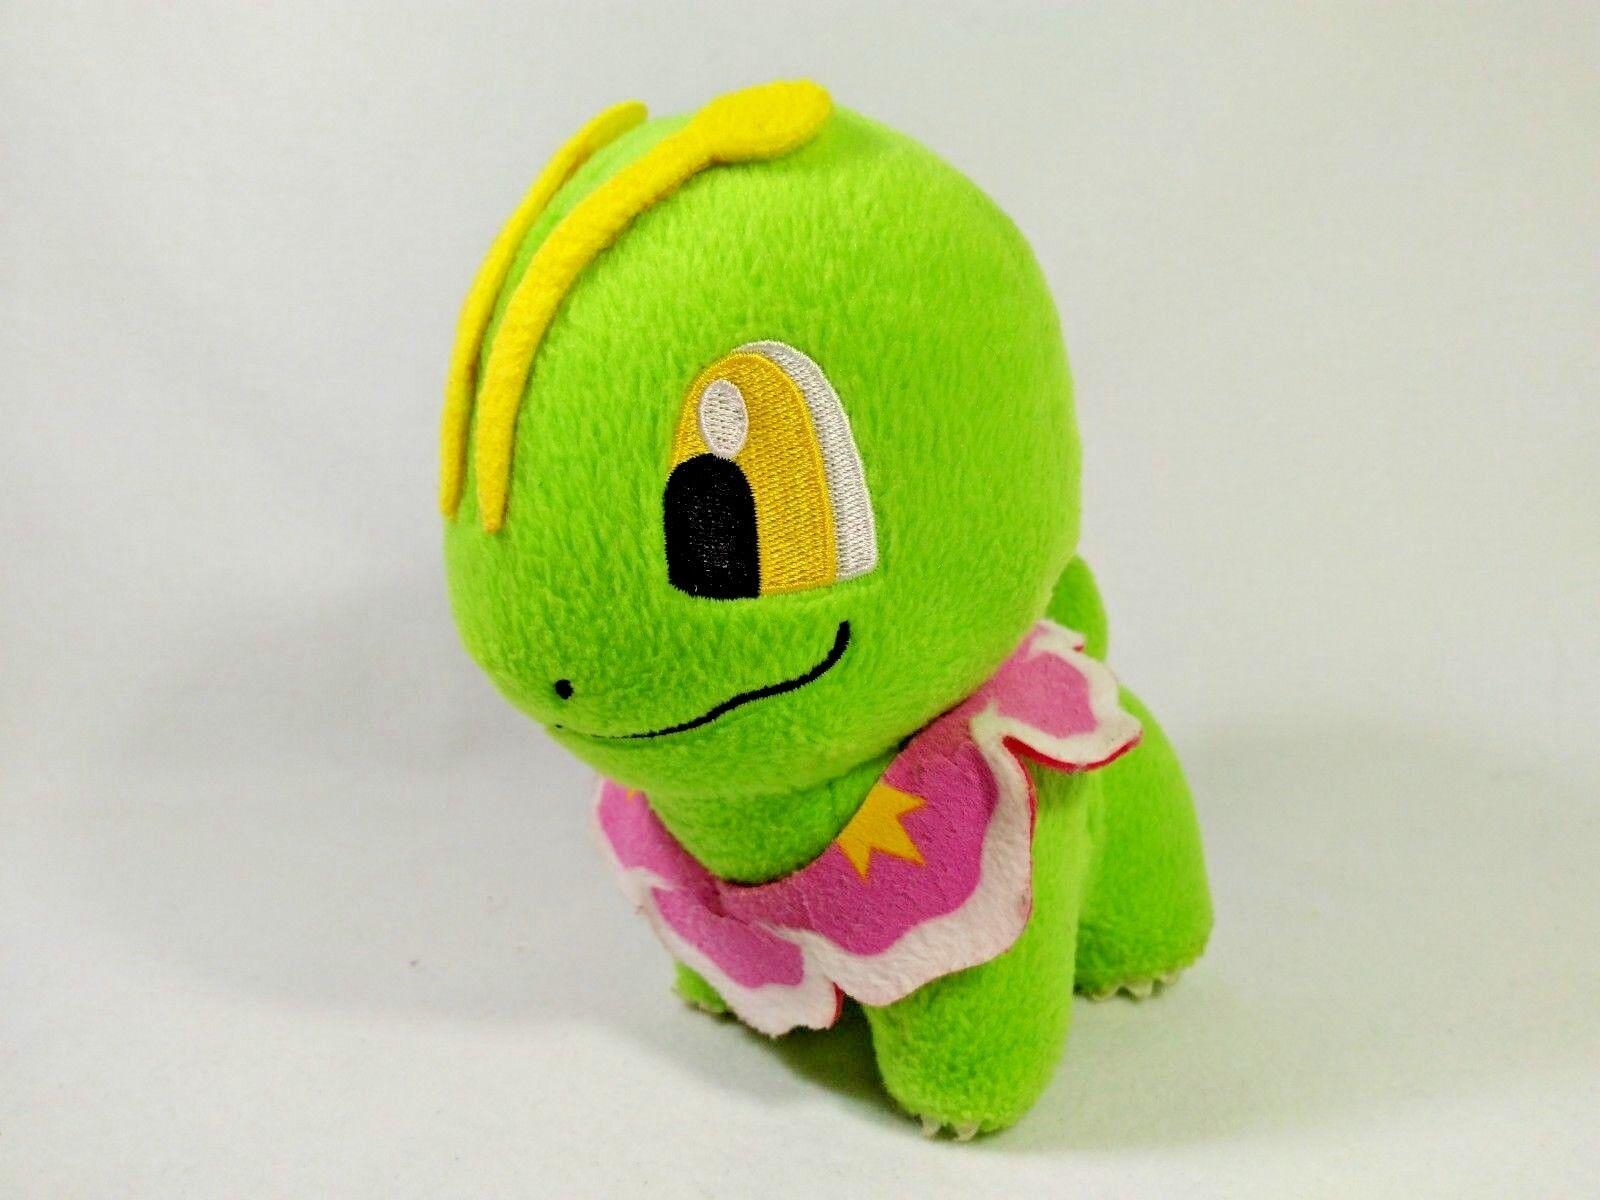 Pokemon Bayleef Plush Doll Stuffed Toy UFO Banpresto Banpresto Banpresto 2001 Japan Meganium Evo 2dc2f0